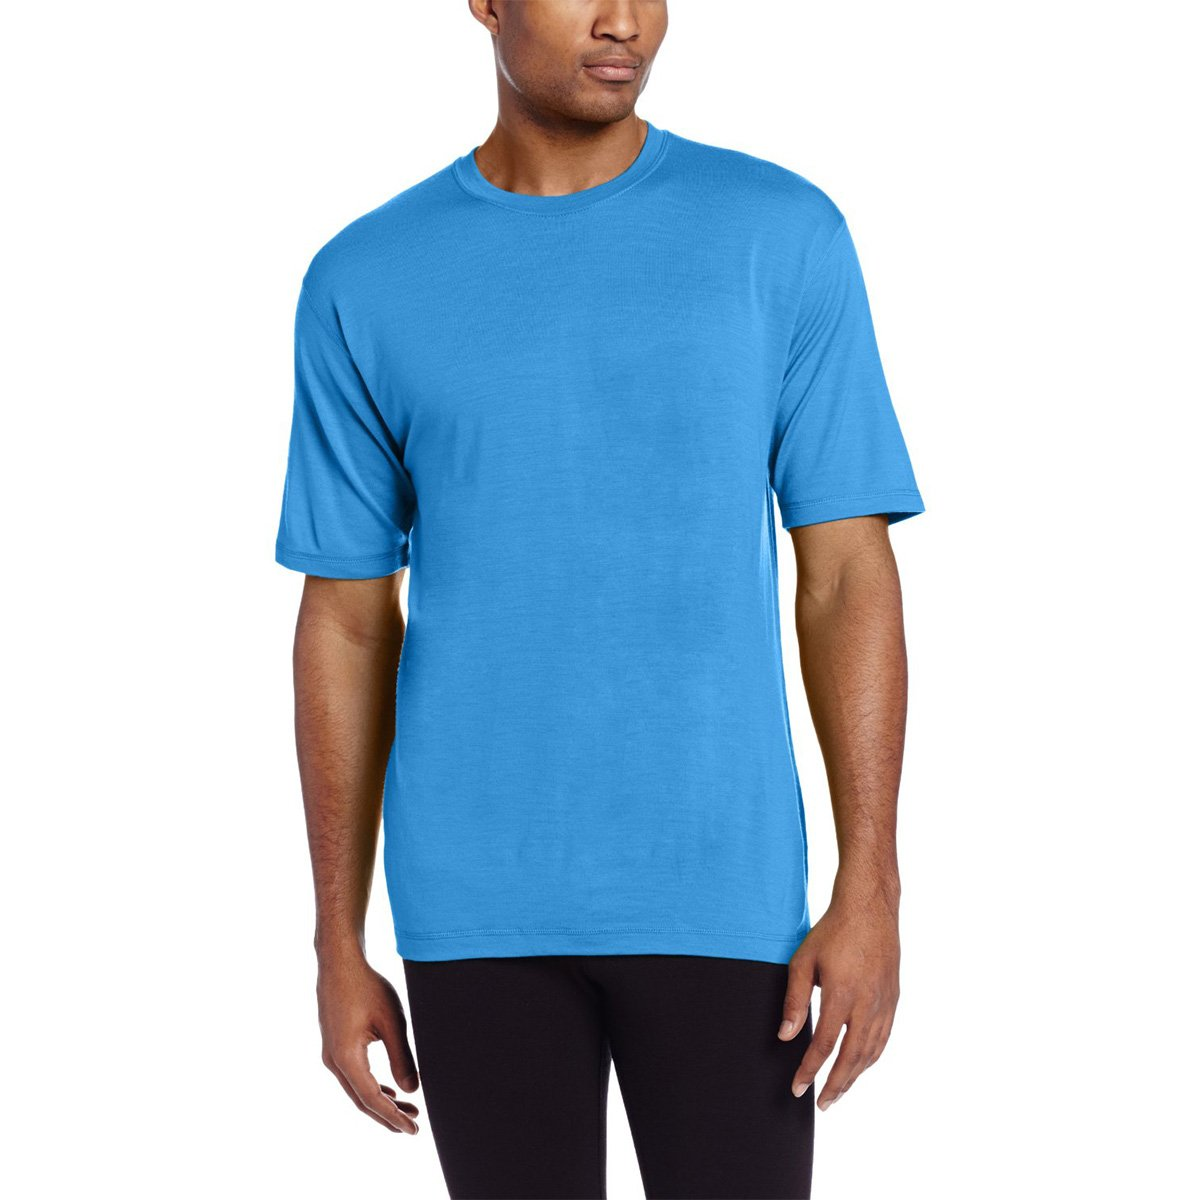 Minus33 Merino Wool Men's Algonquin Lightweight Short Sleeve Crew, Azure Blue, X-Large